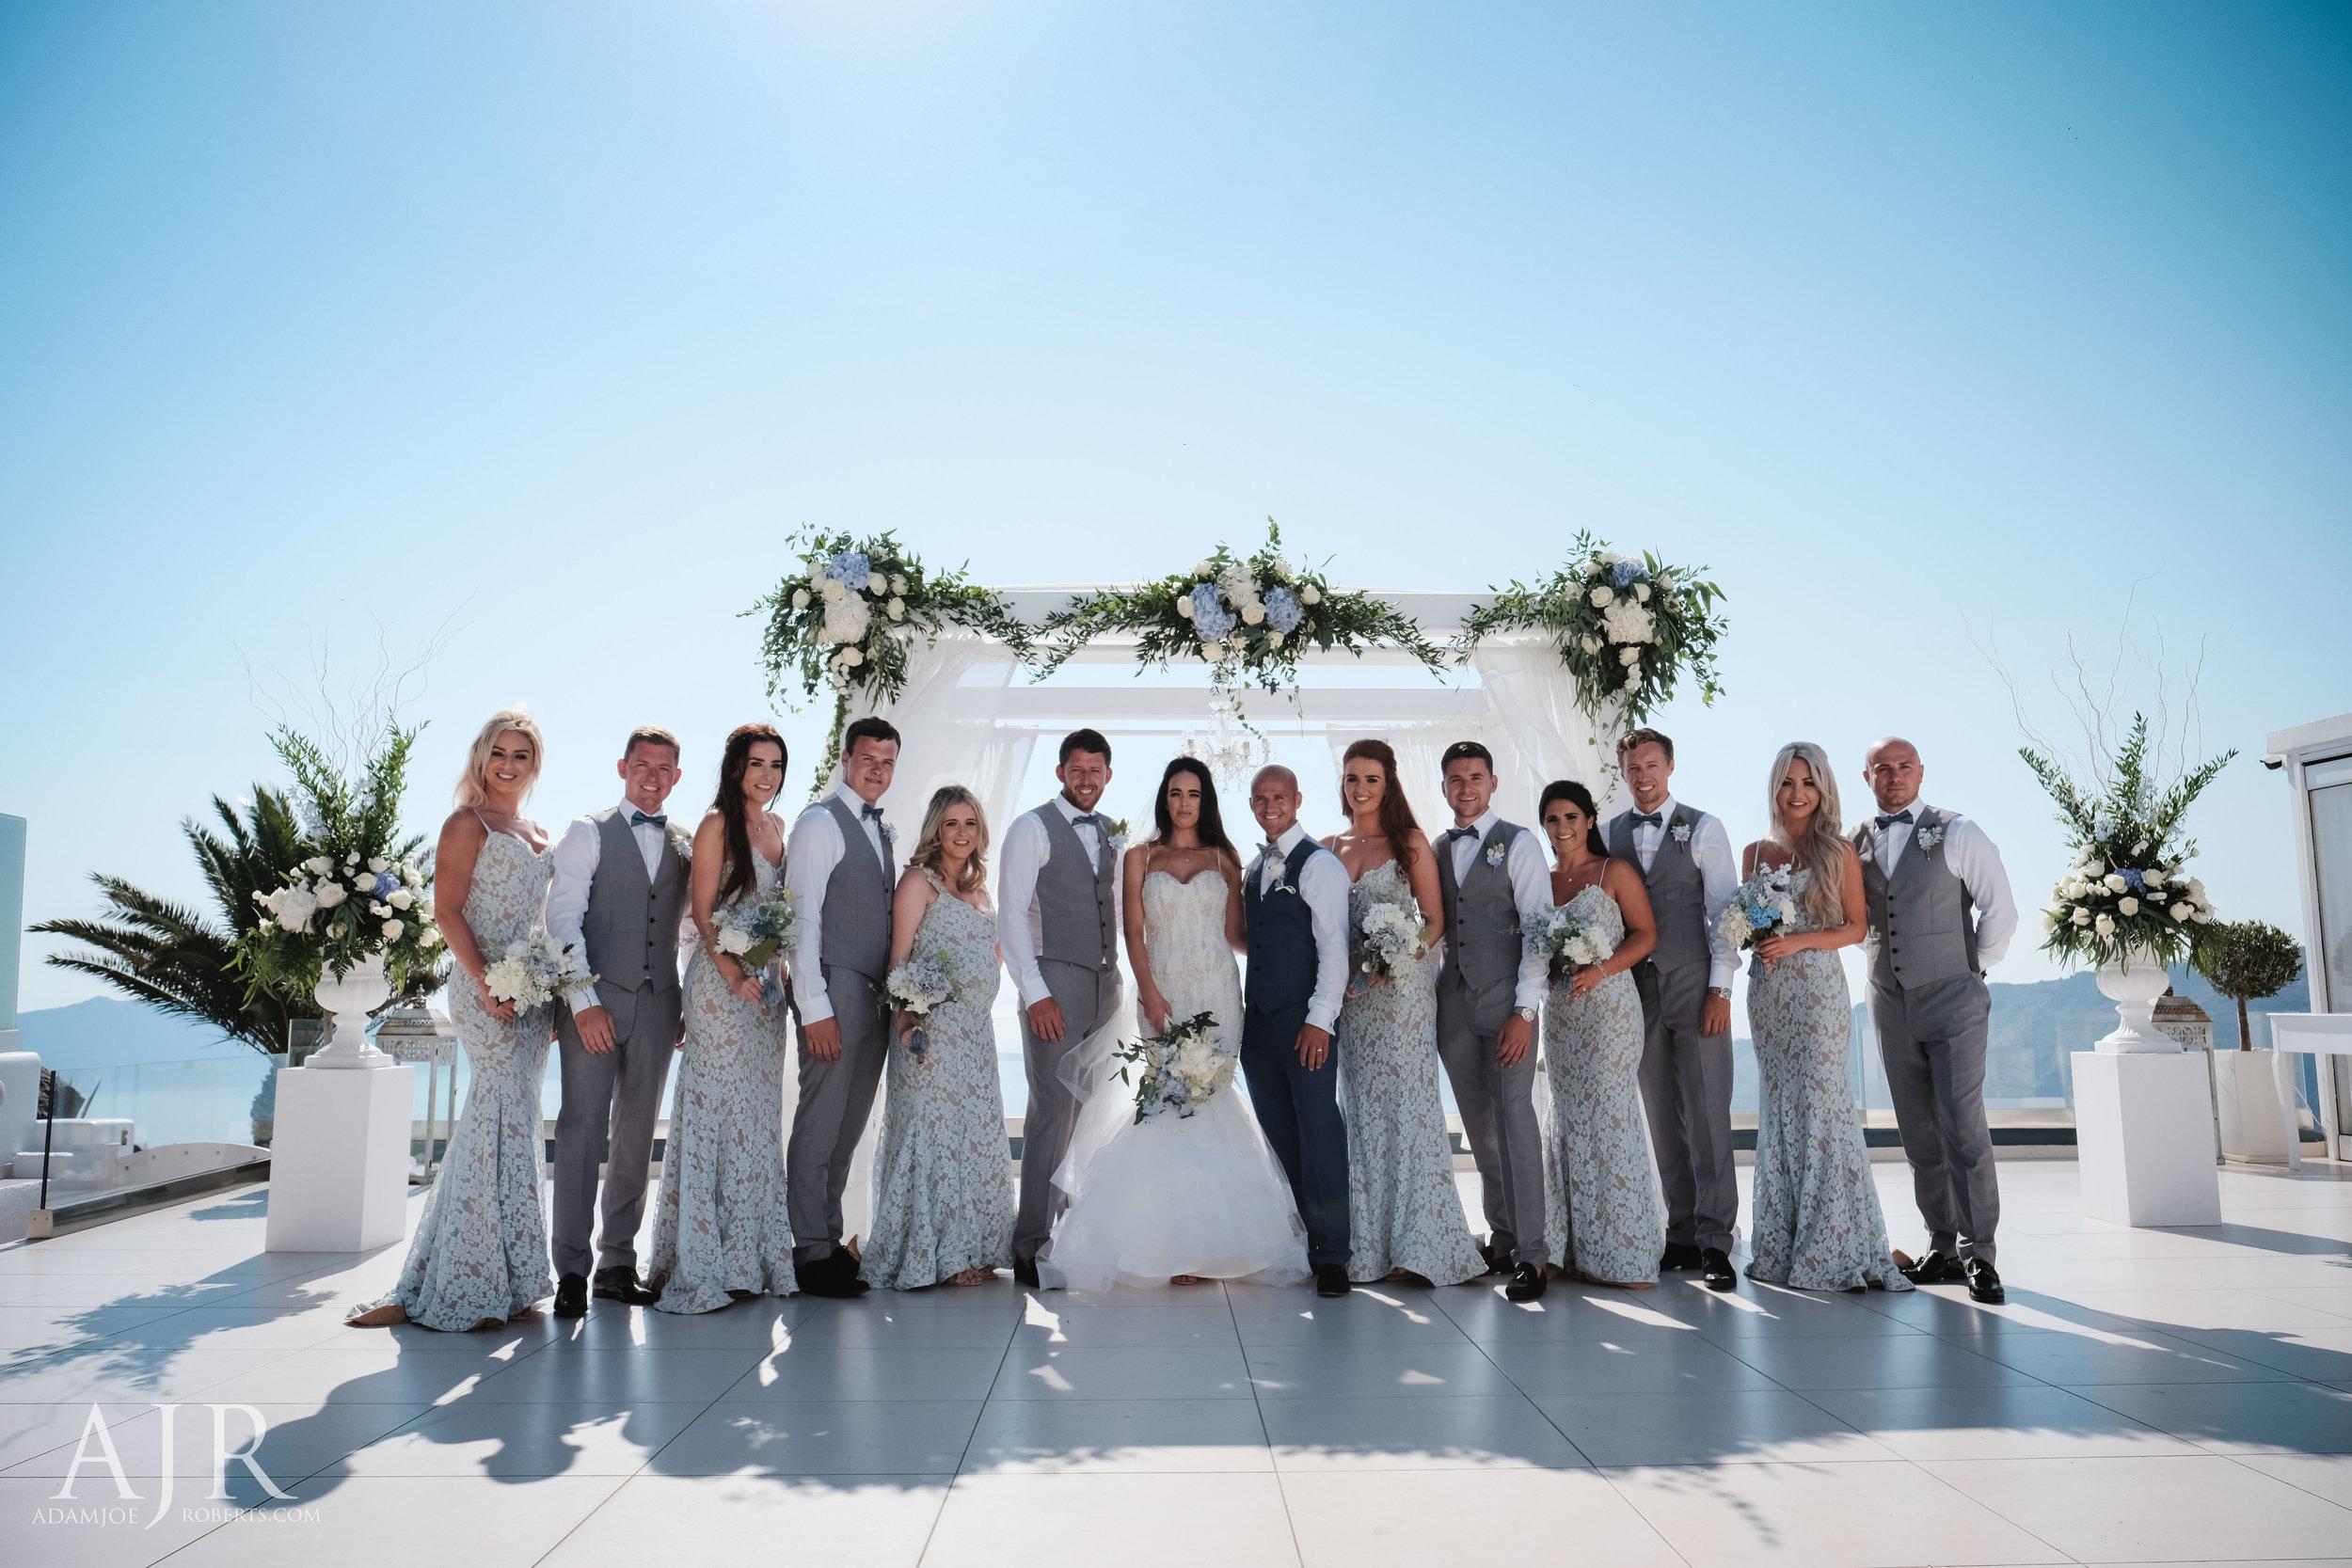 Mollie and Antony Le Ciel Santorini Destination Wedding - Sneak Peek (5 of 15).jpg